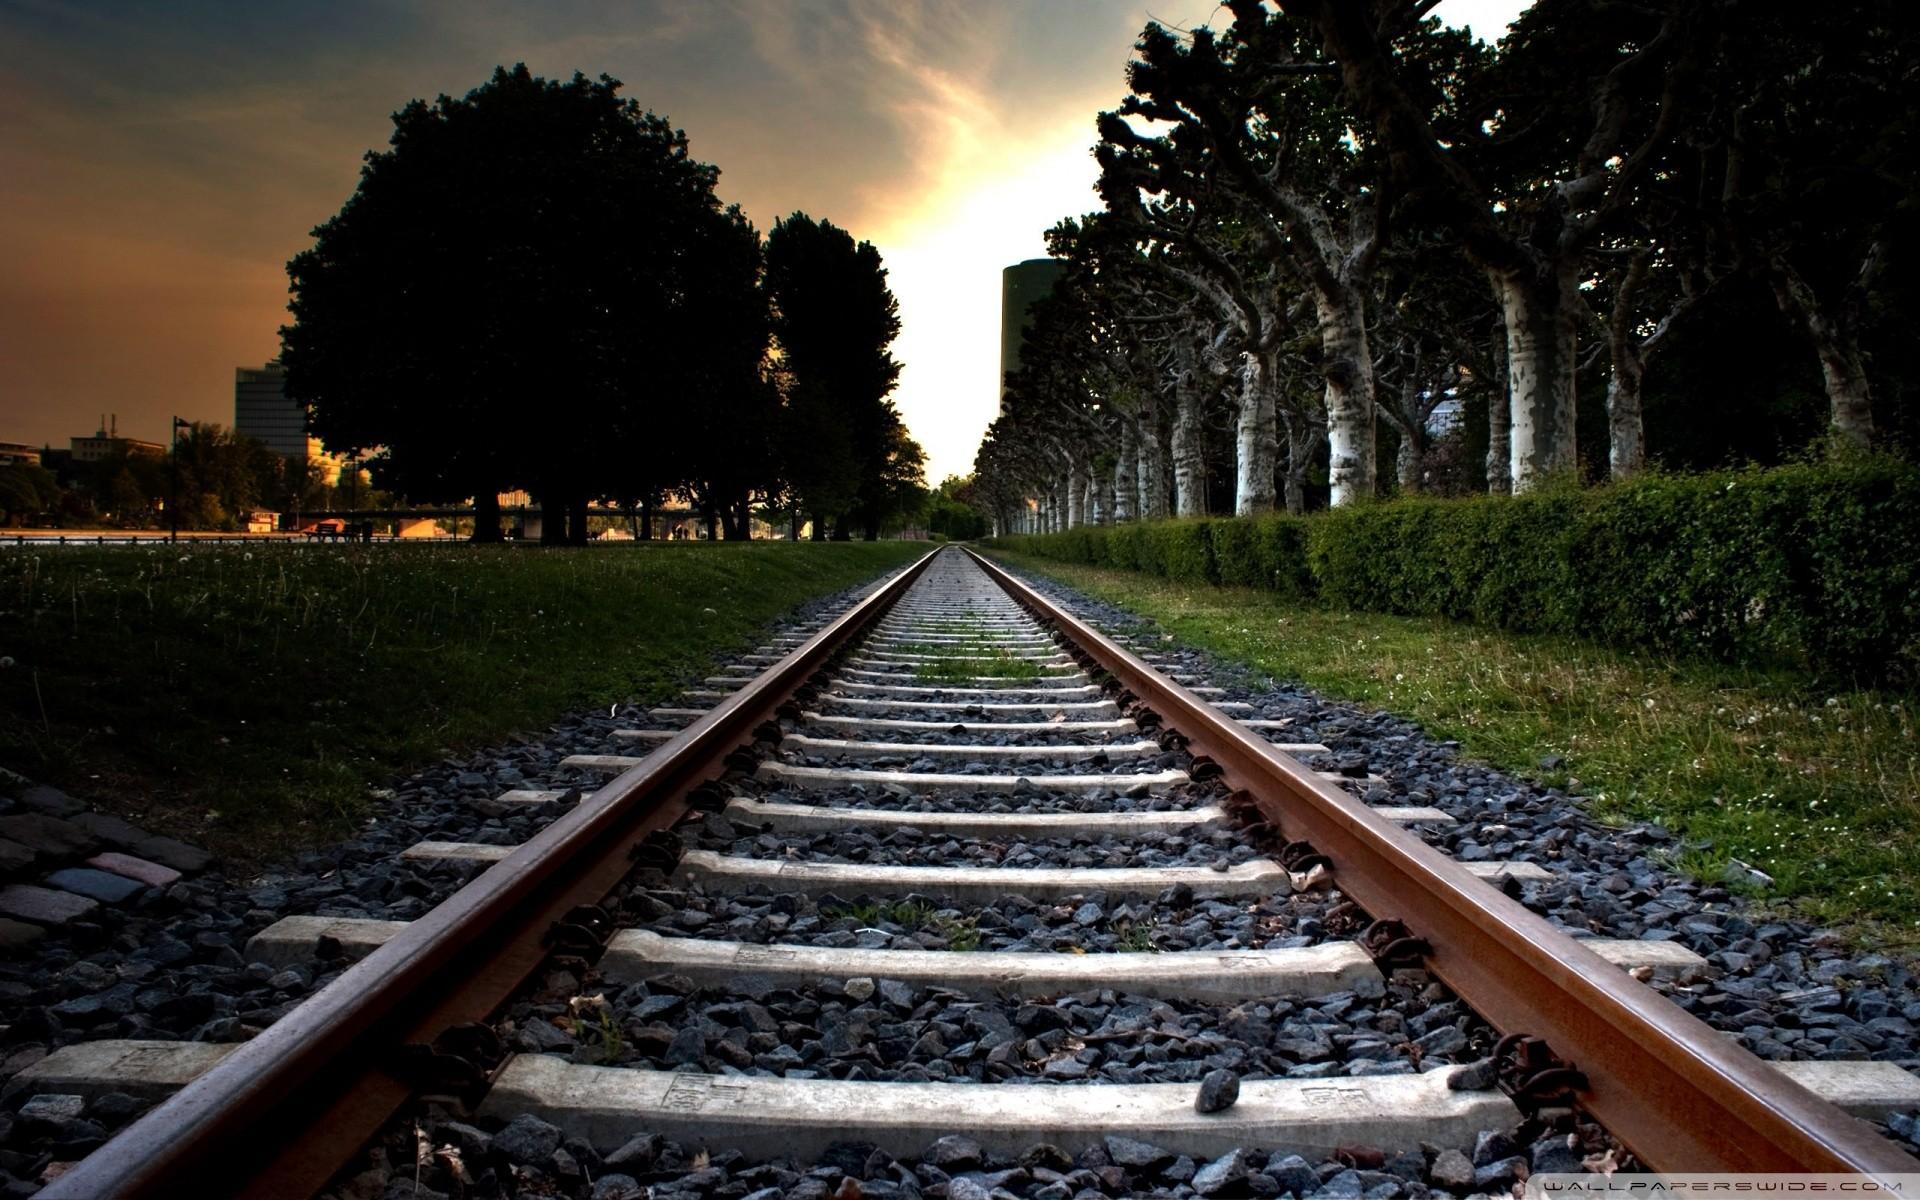 Train Tracks Through Park Picture | Free Photograph